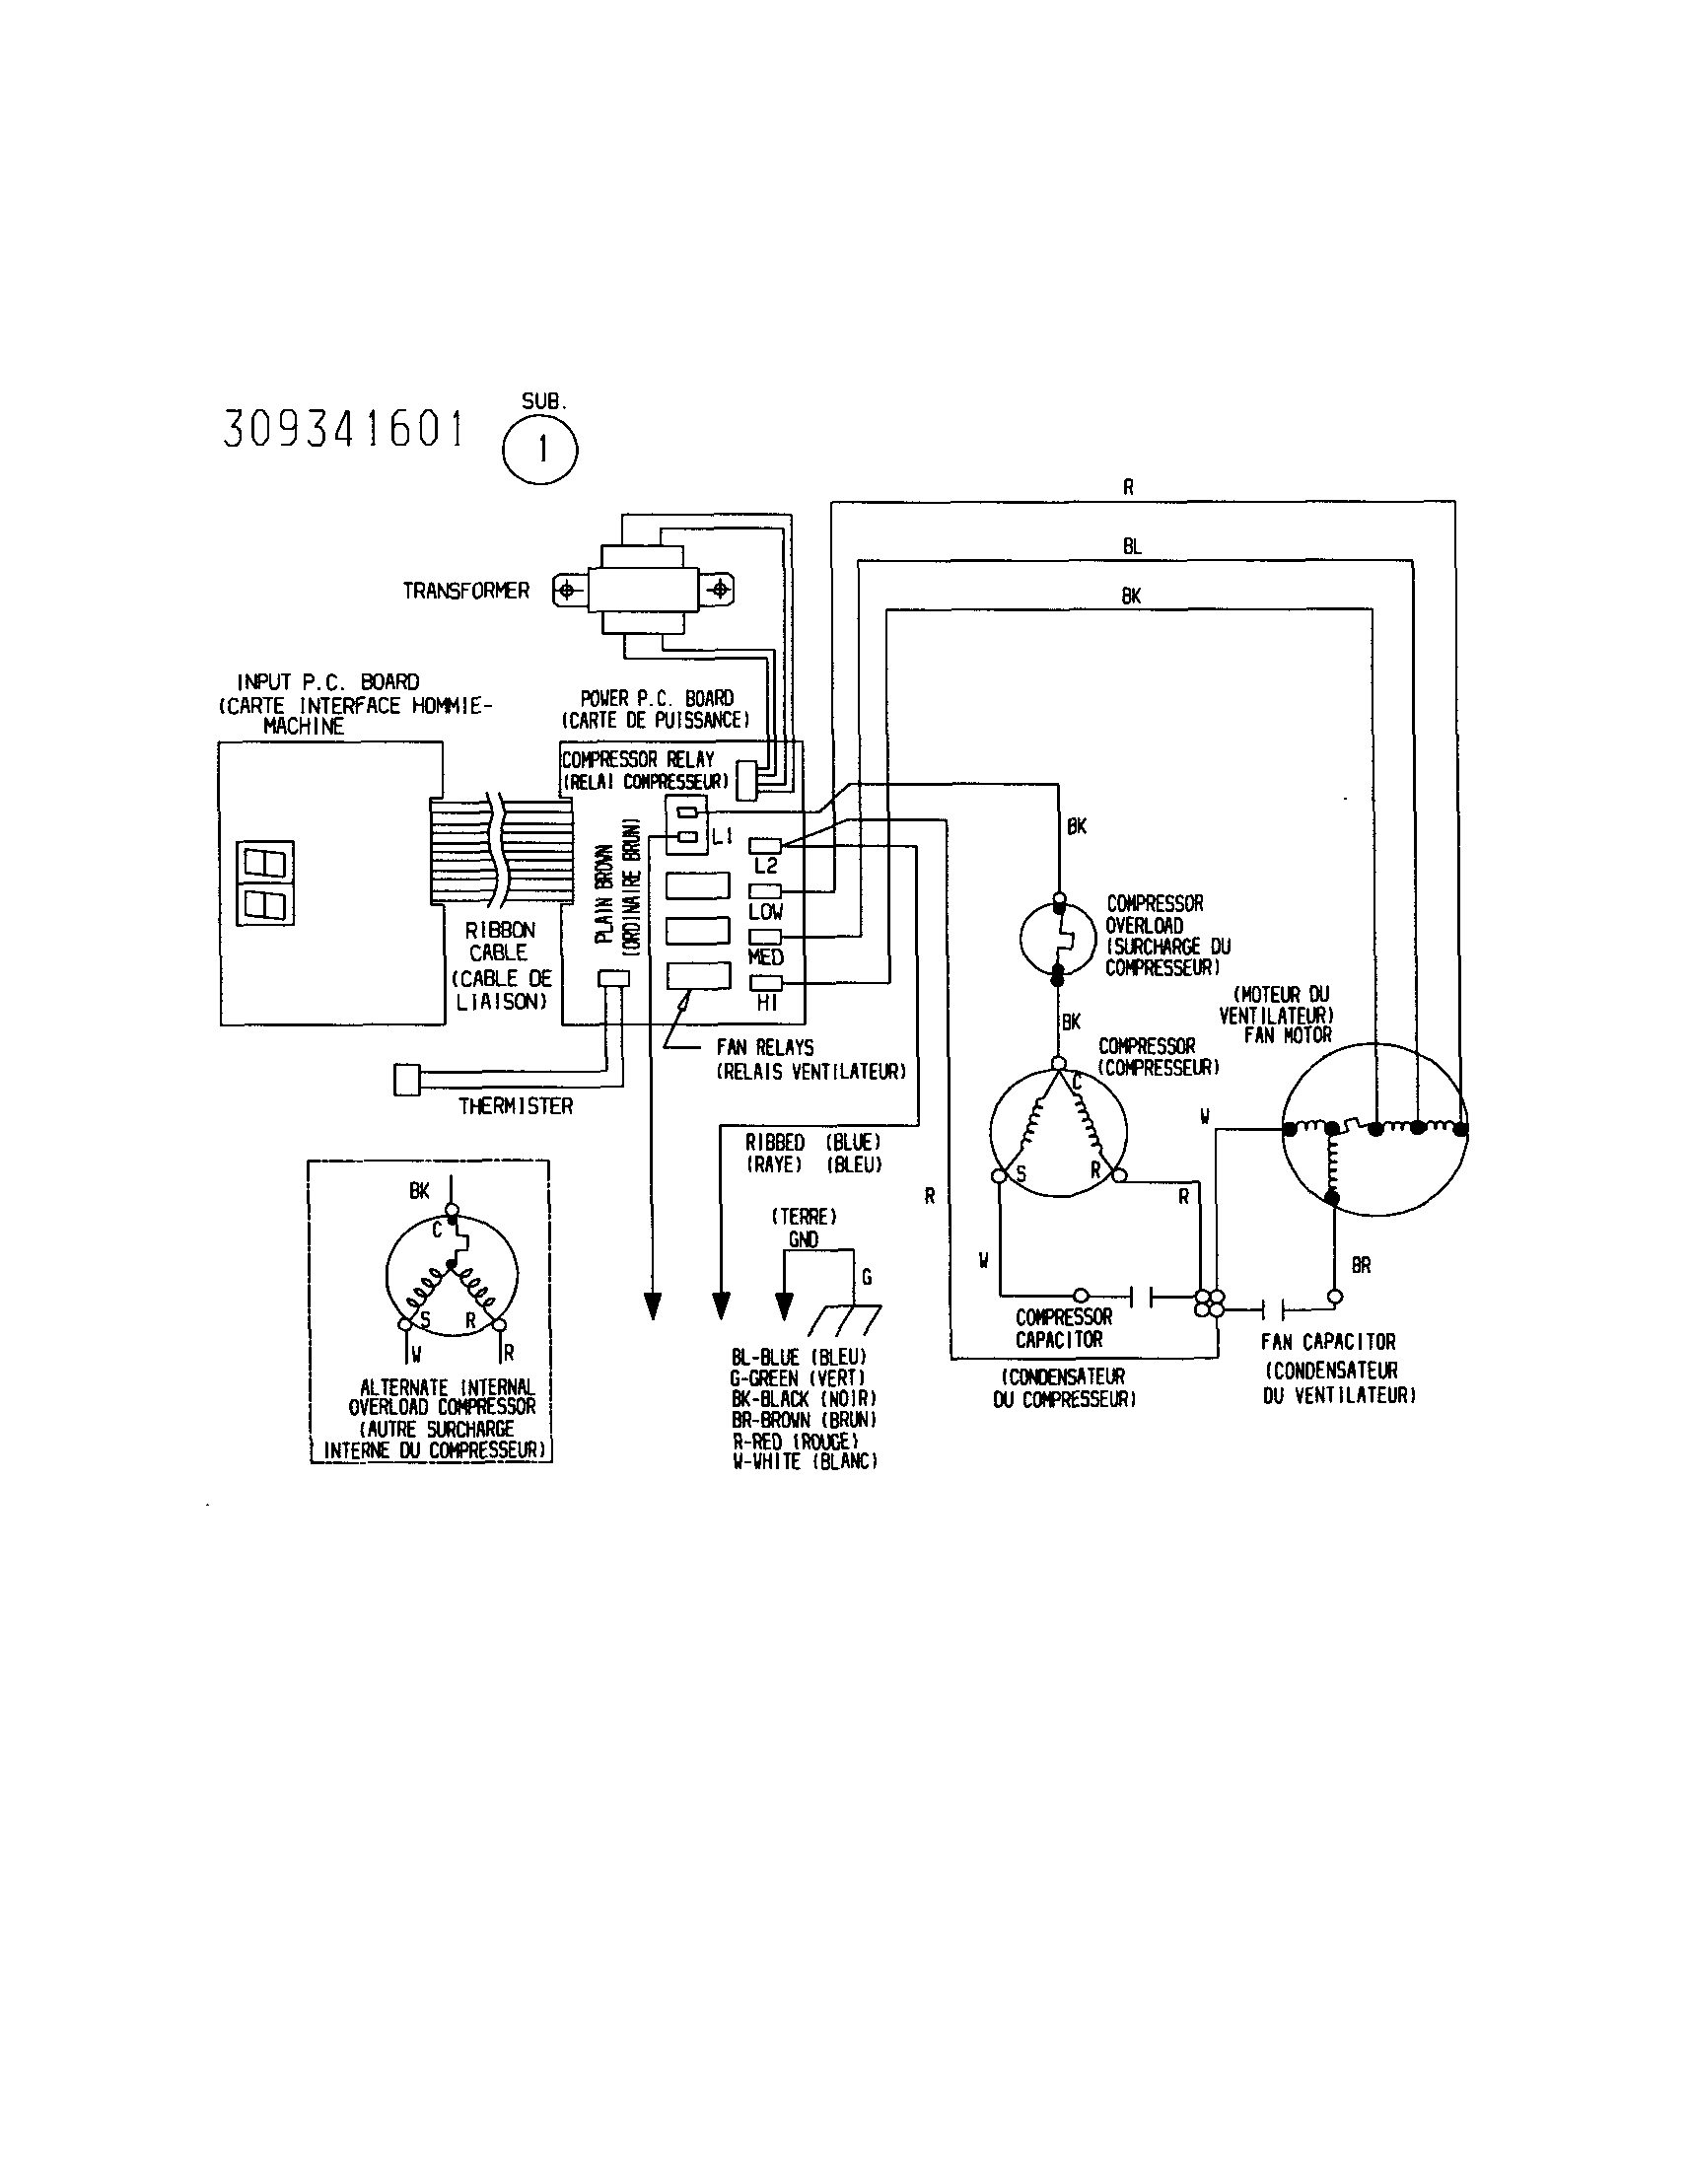 alternating rib relay wiring diagram